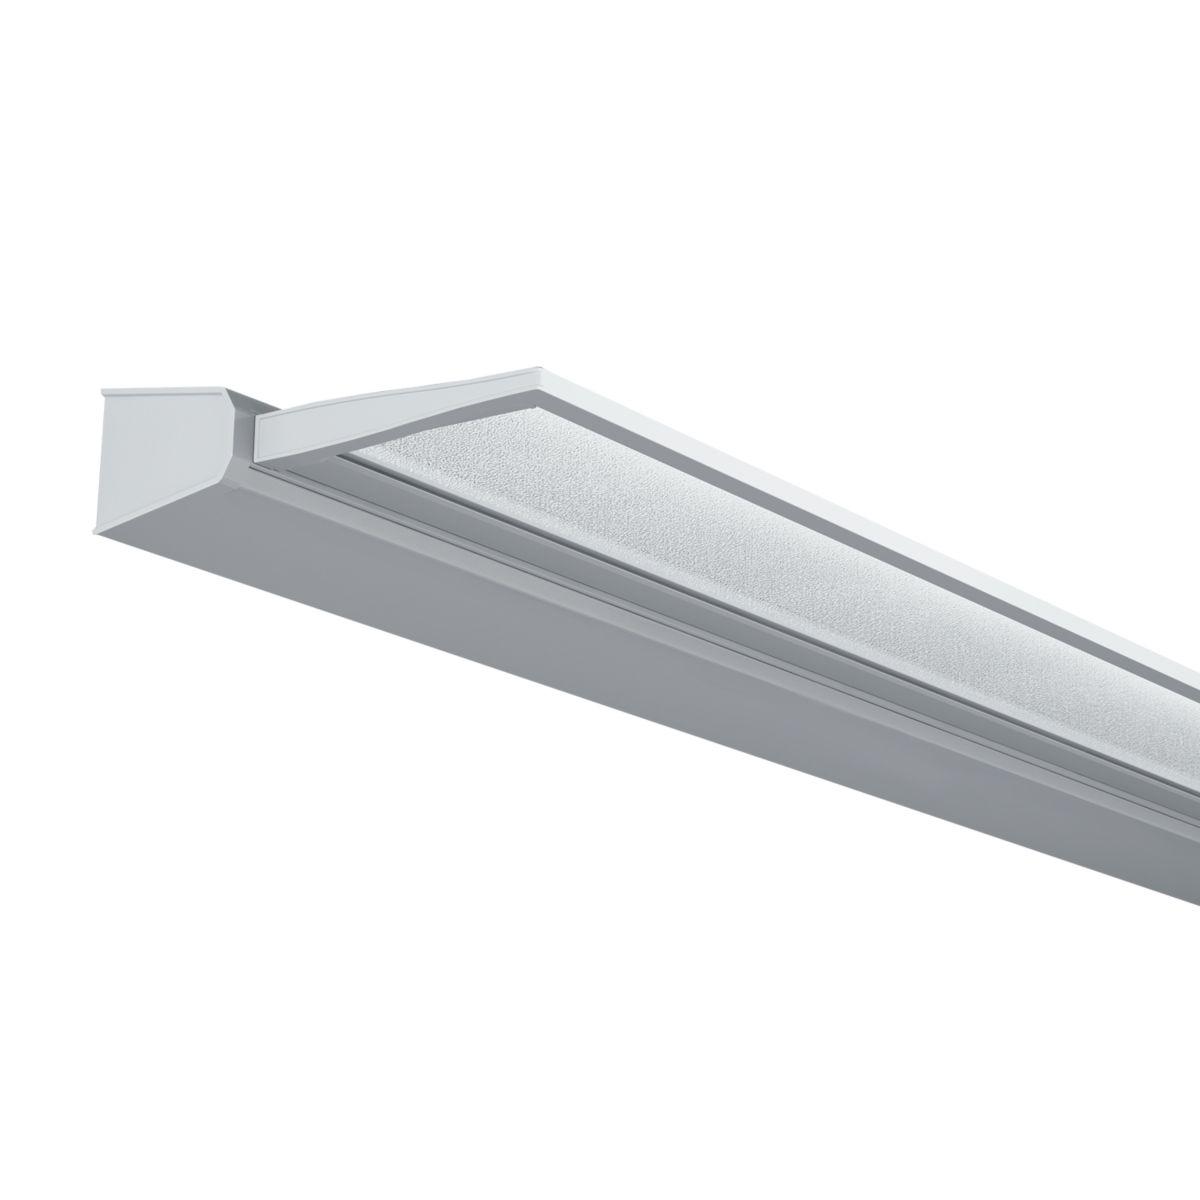 Divide Wall LED